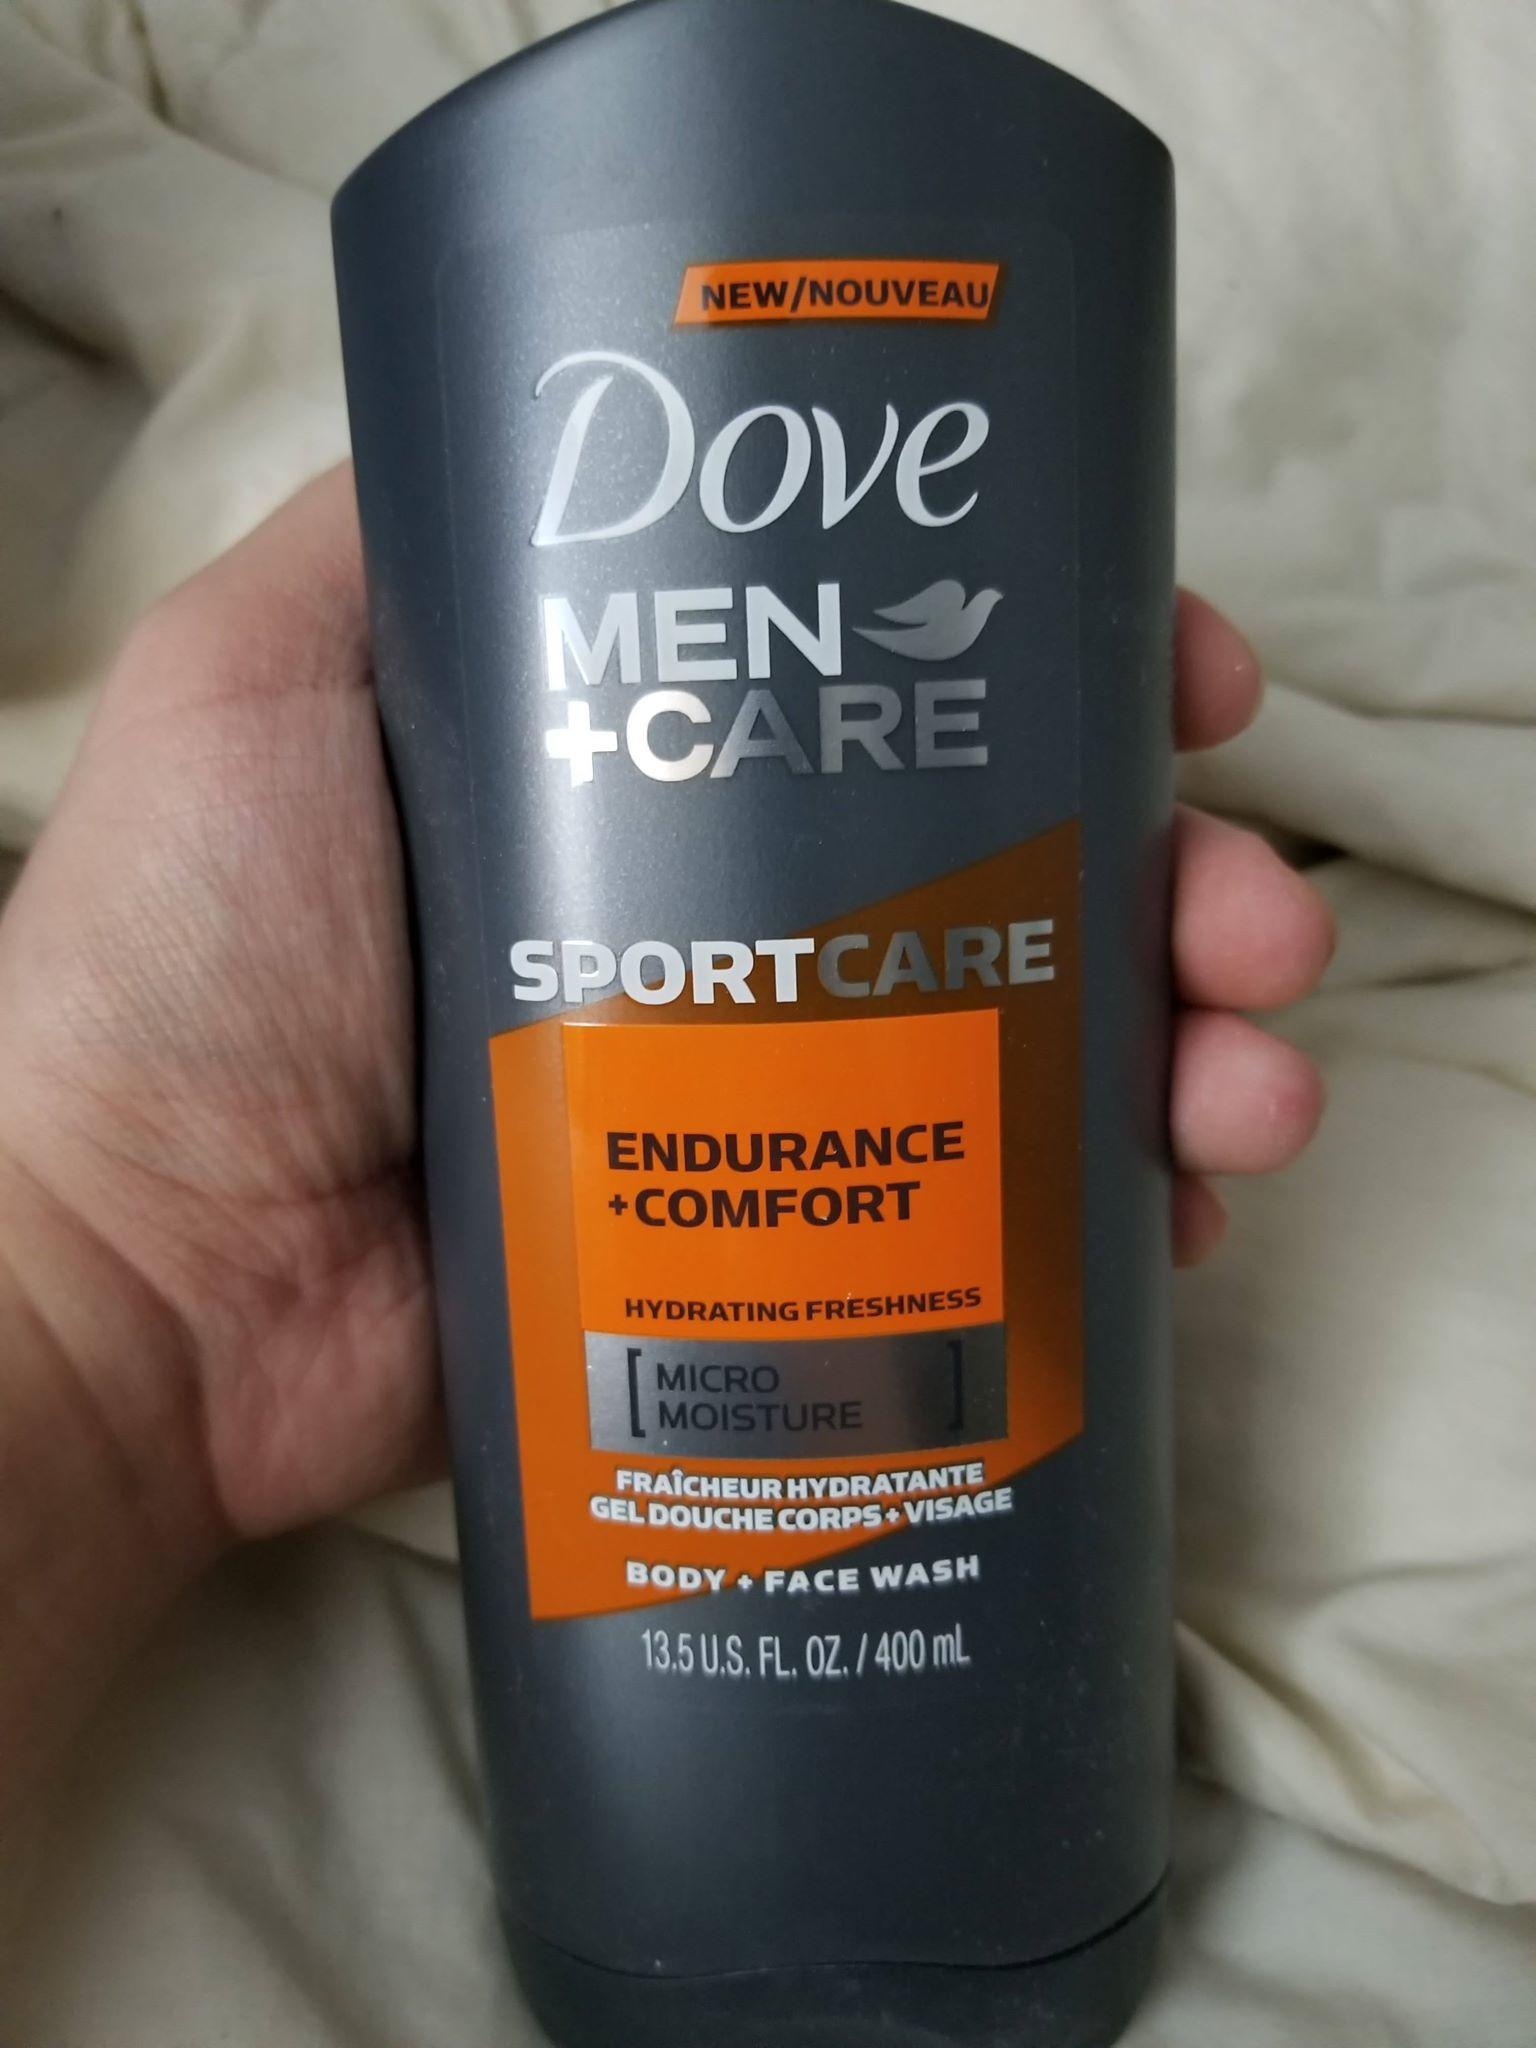 Dove Men Care Sportcare Power Renew Body Face Wash Reviews In Men S Body Wash Chickadvisor